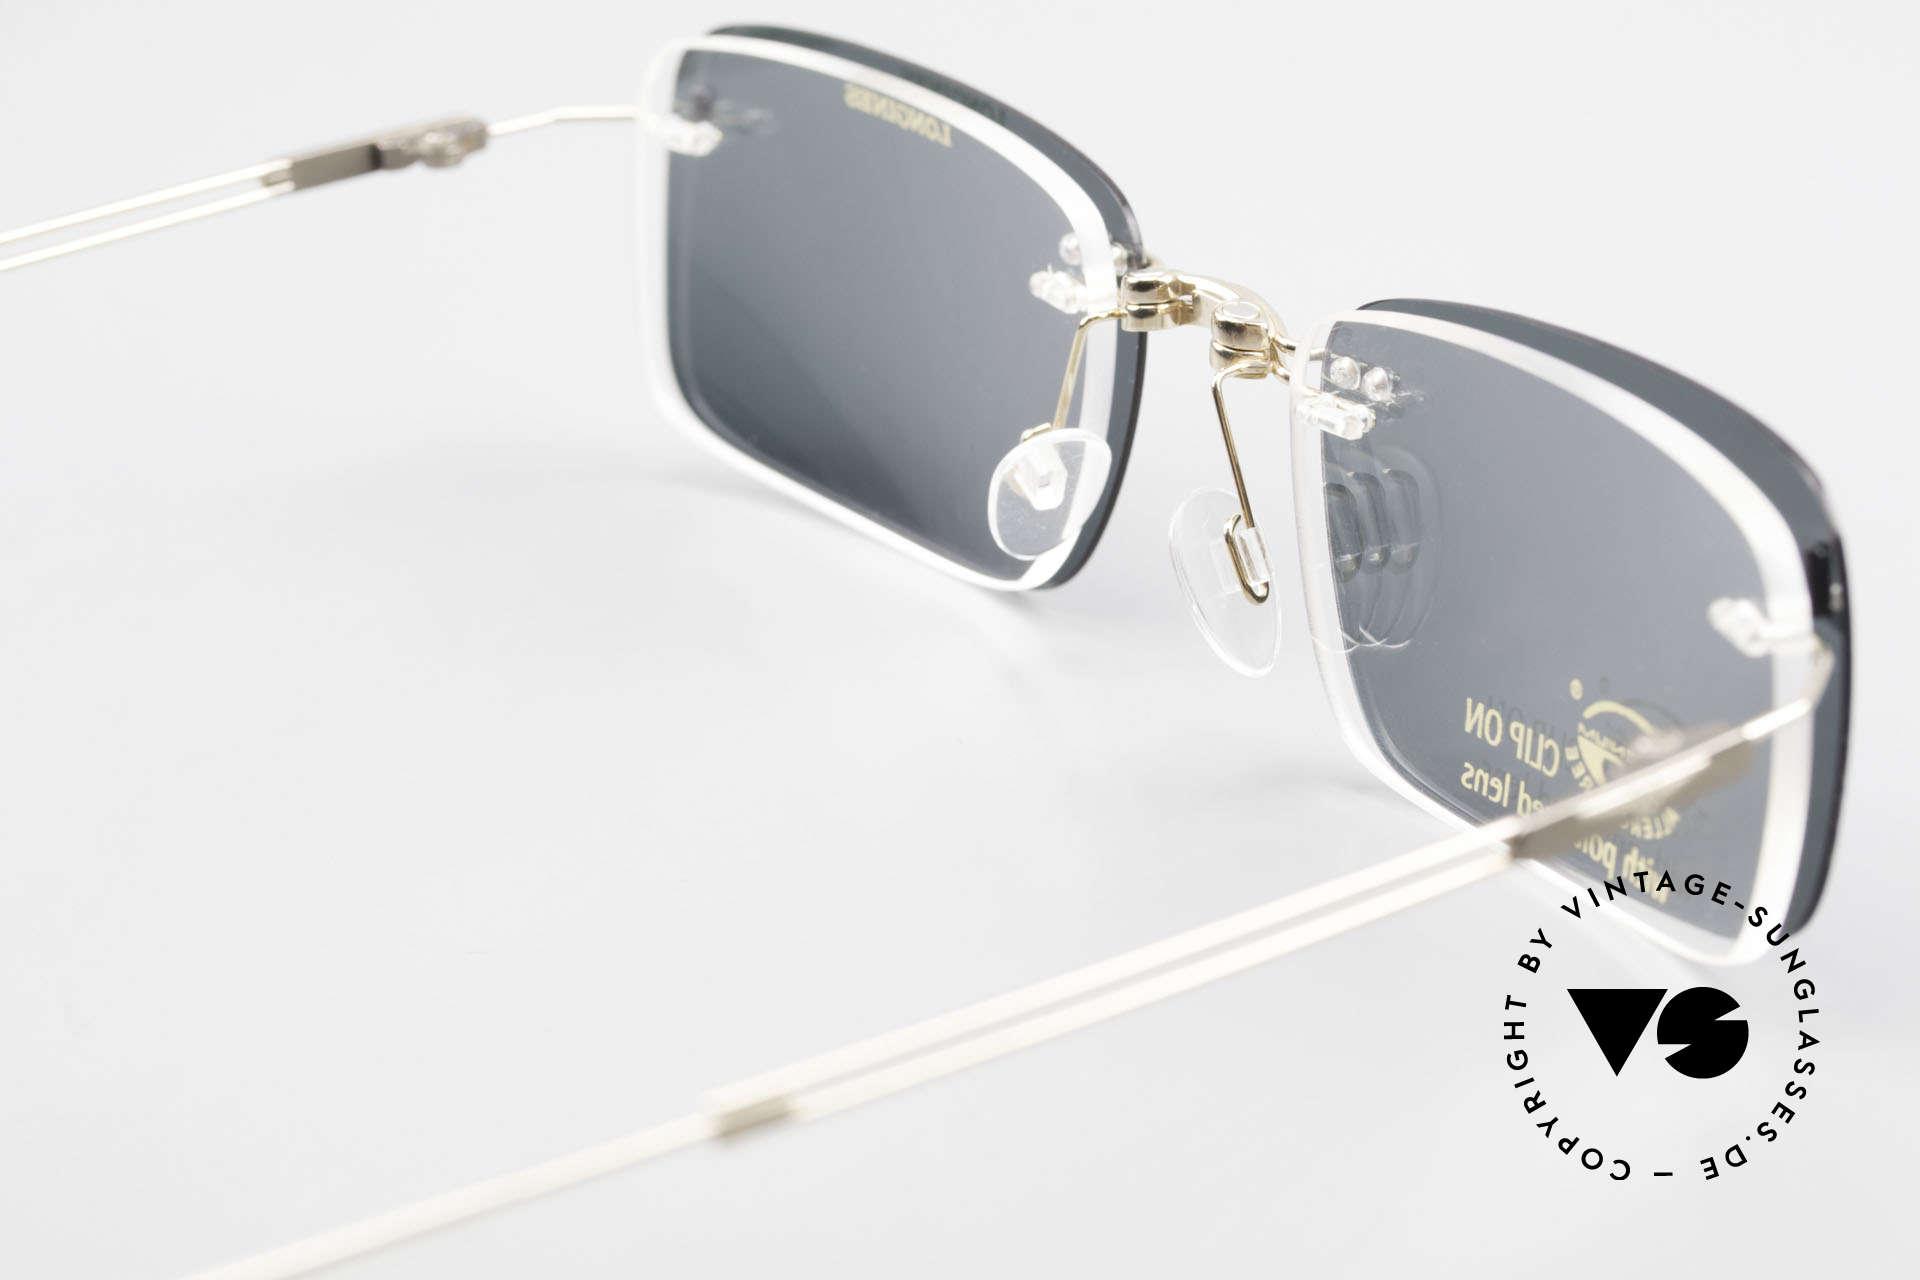 Longines 4367 Polarized Glasses Rimless 90s, Size: medium, Made for Men